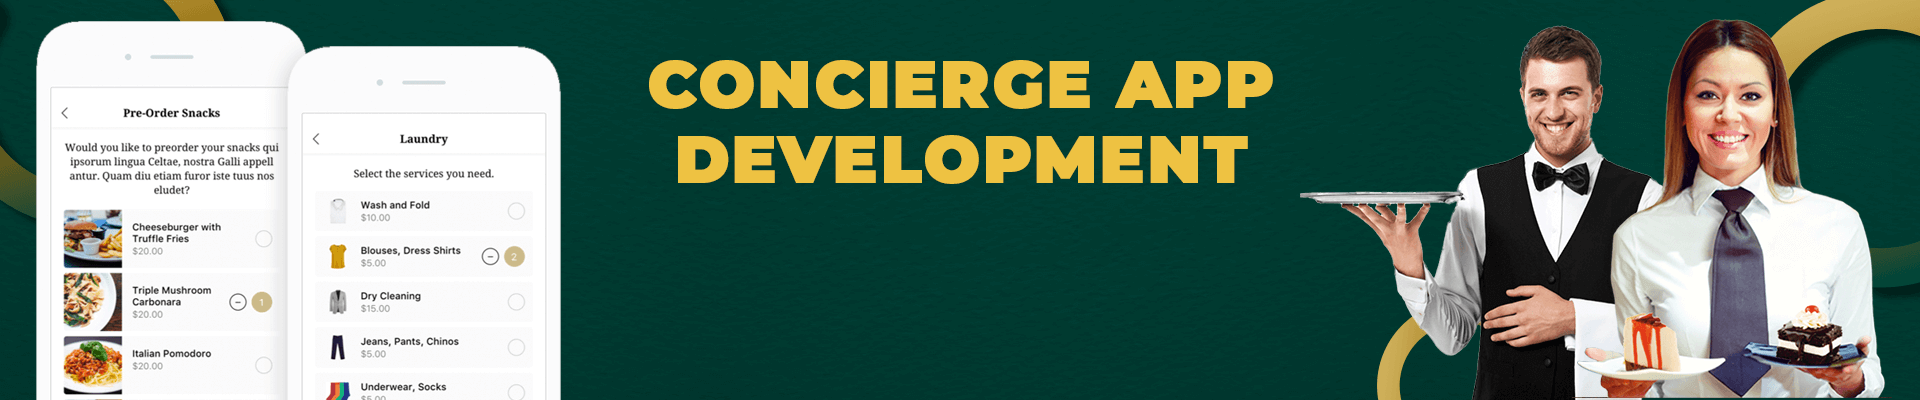 Best Concierge App Development Company